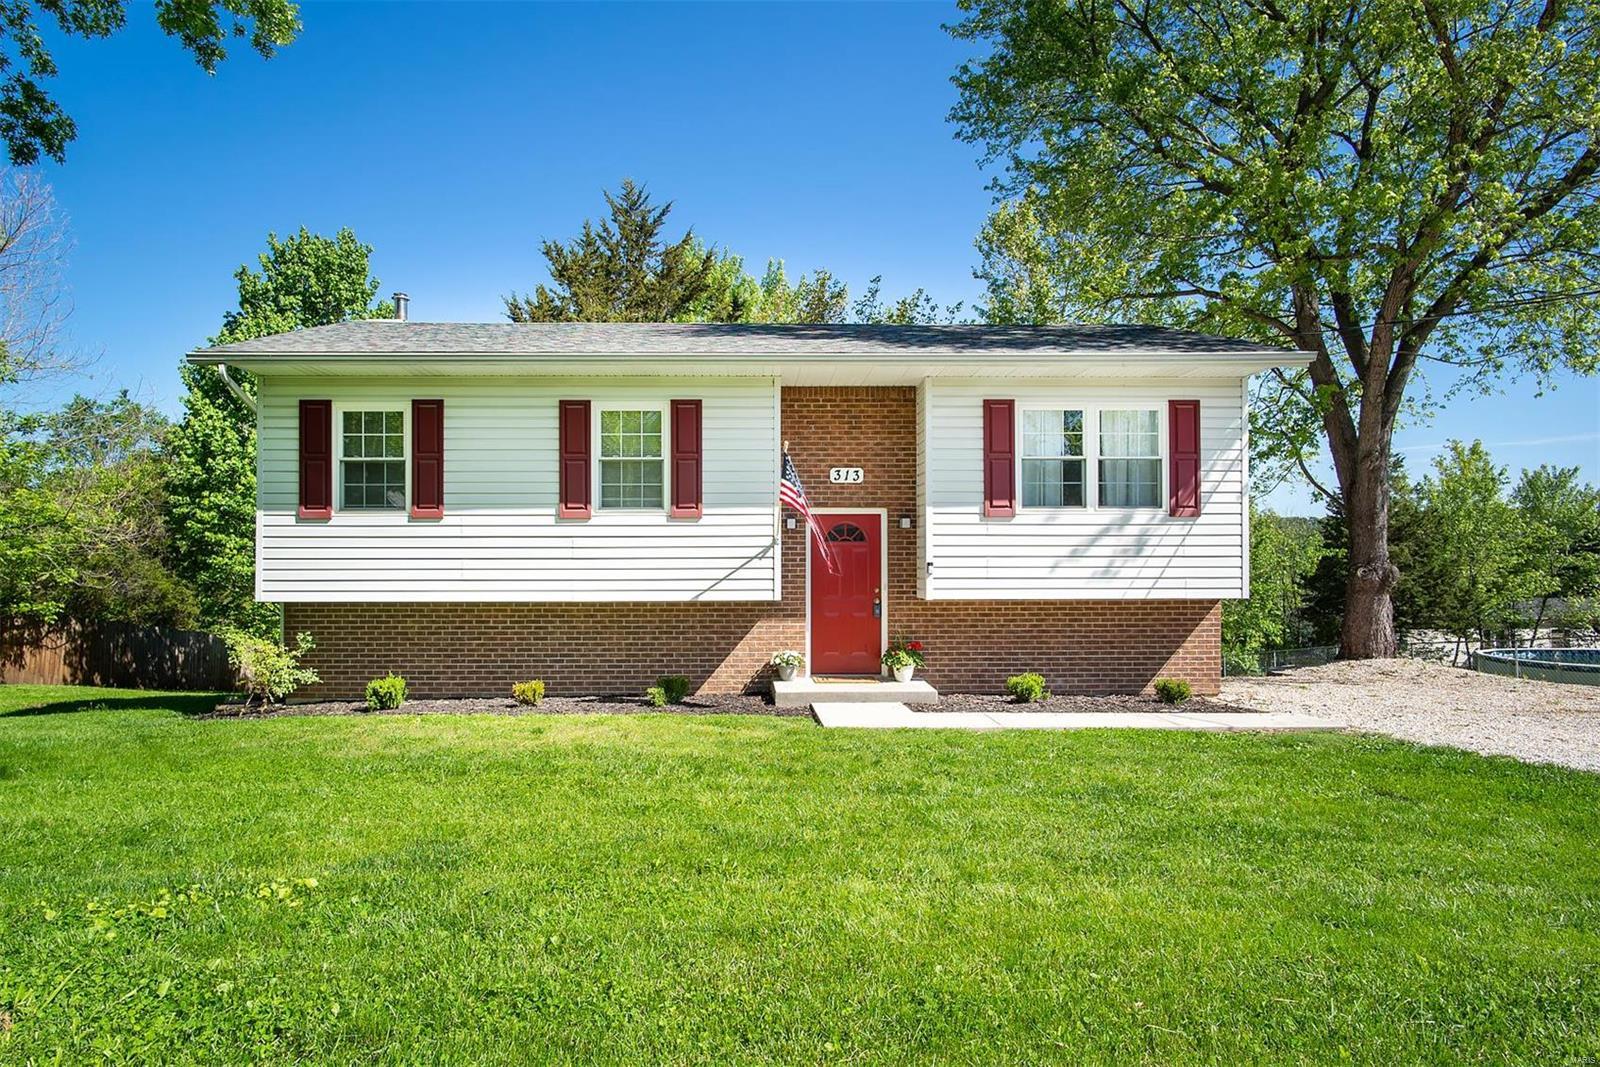 313 Kronos Property Photo - De Soto, MO real estate listing